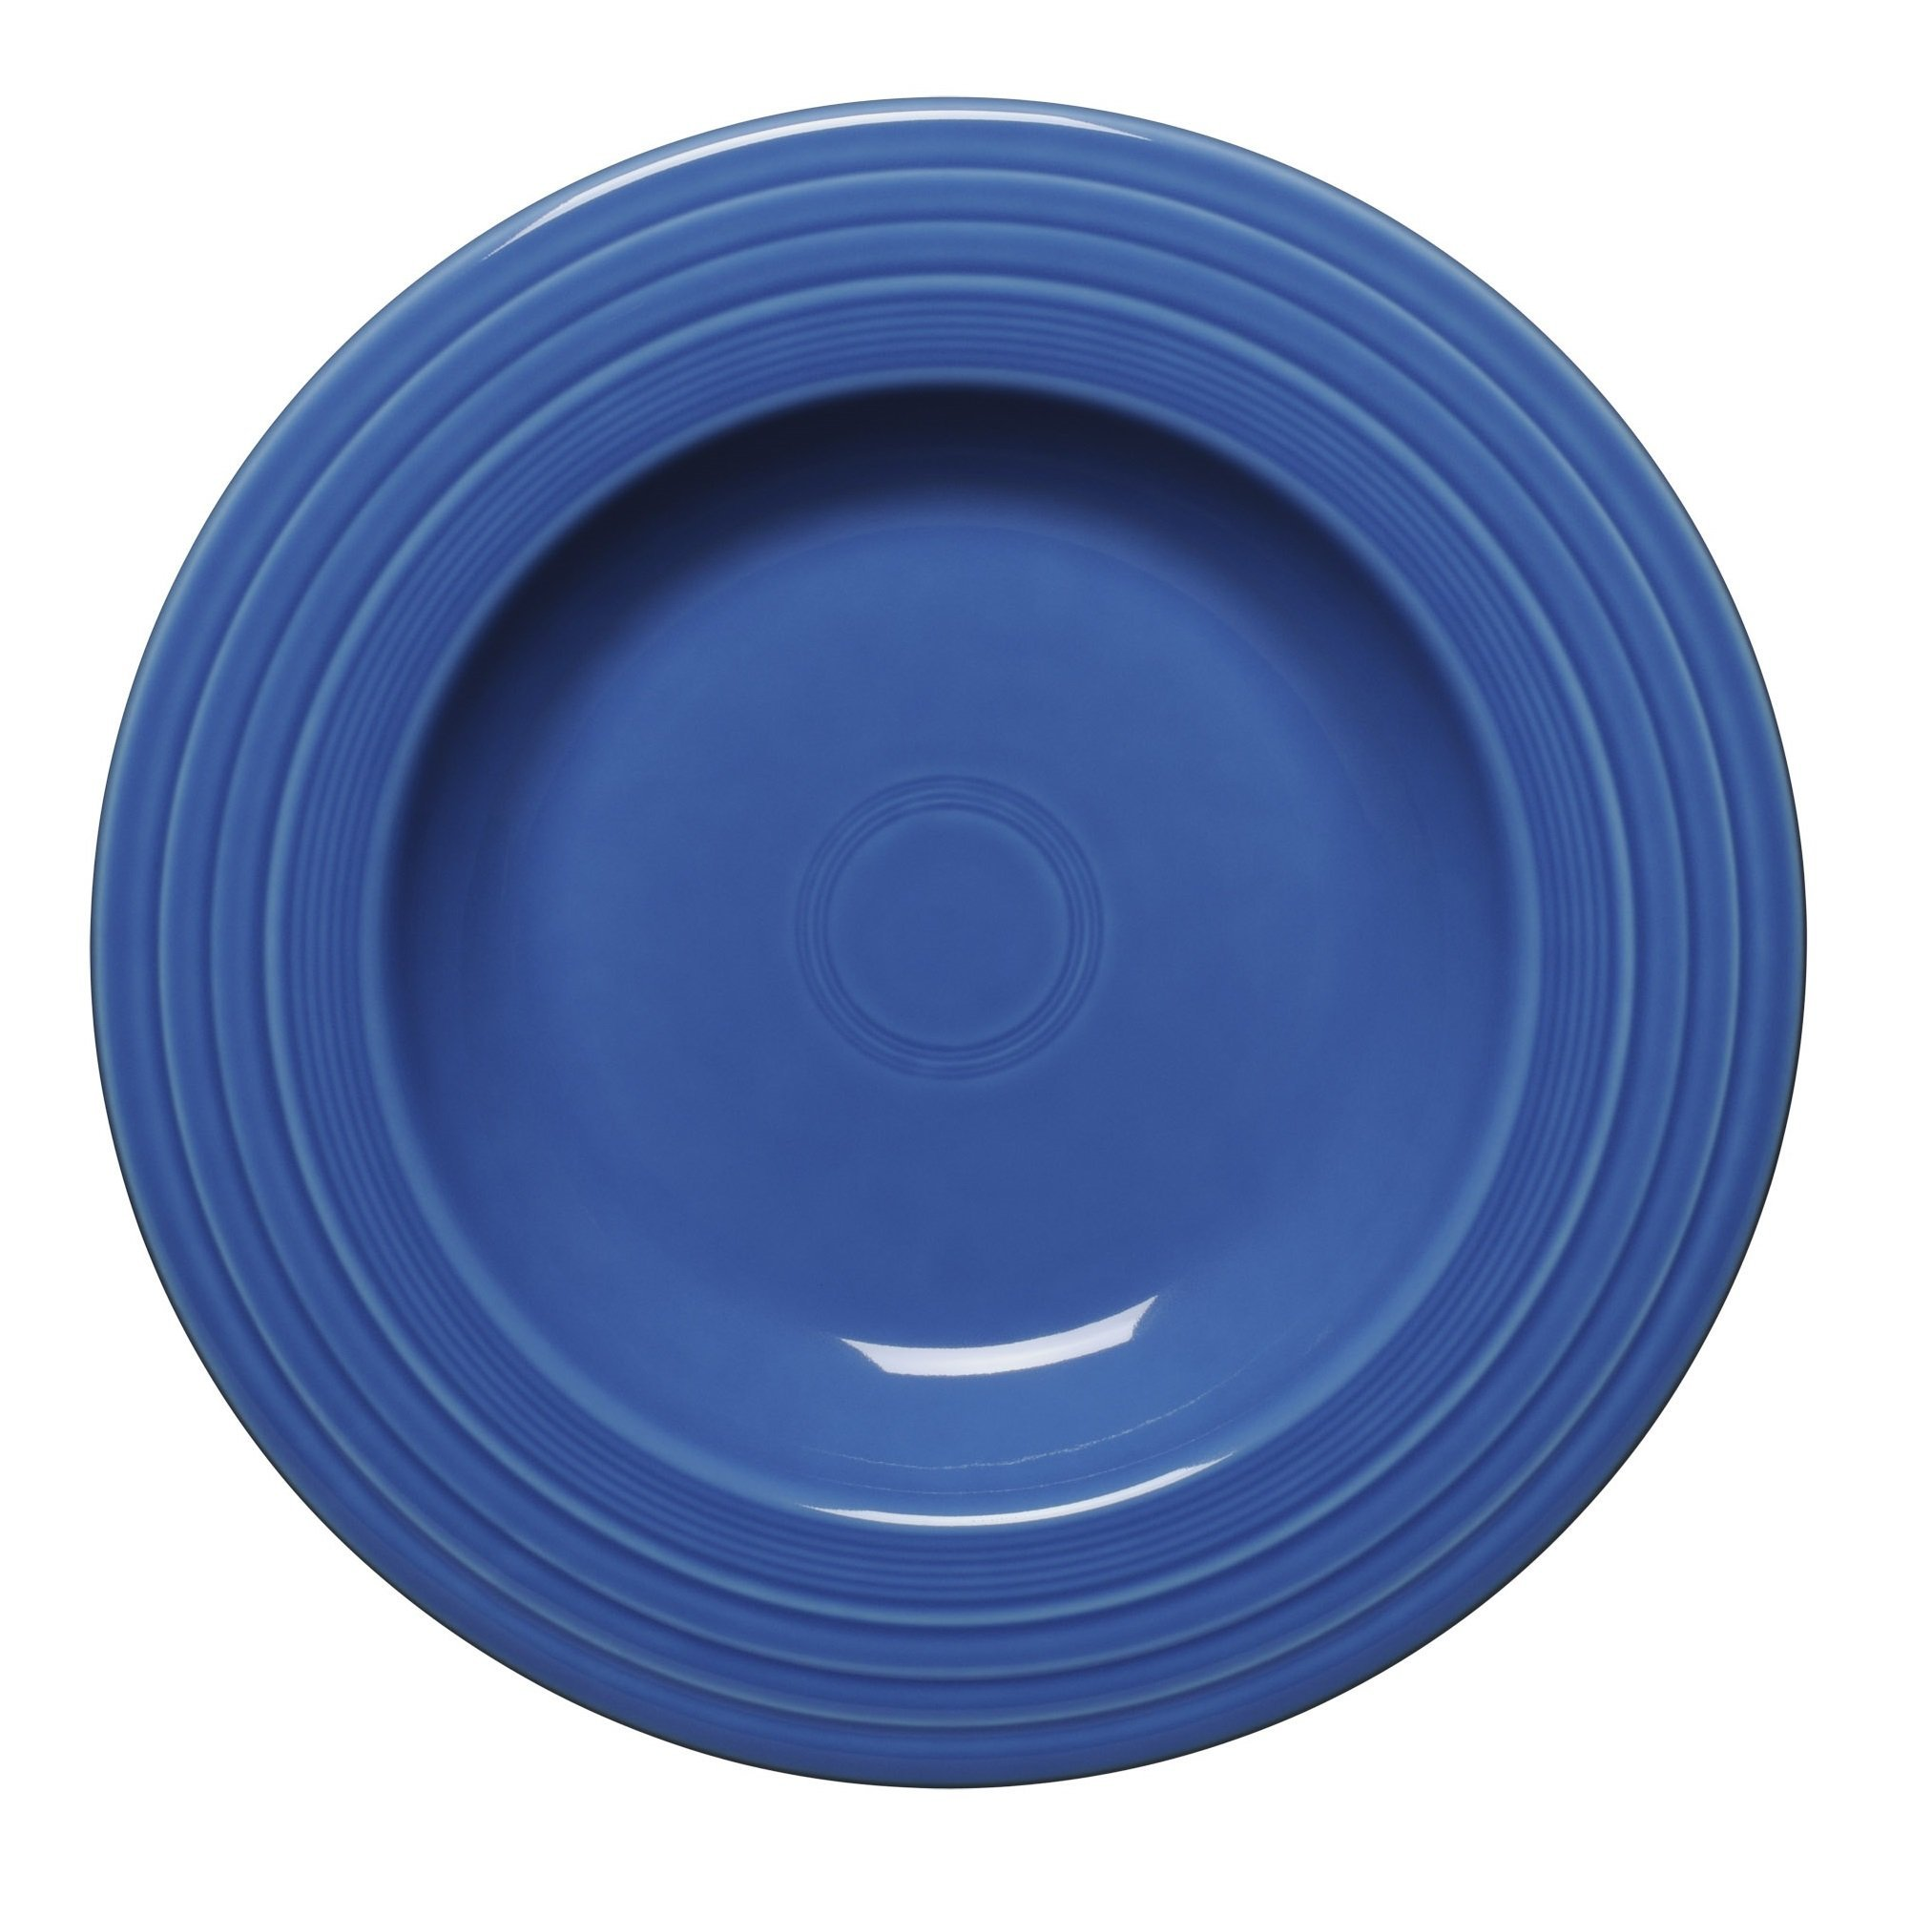 Fiesta Pasta Bowl, 10-Inch, Lapis